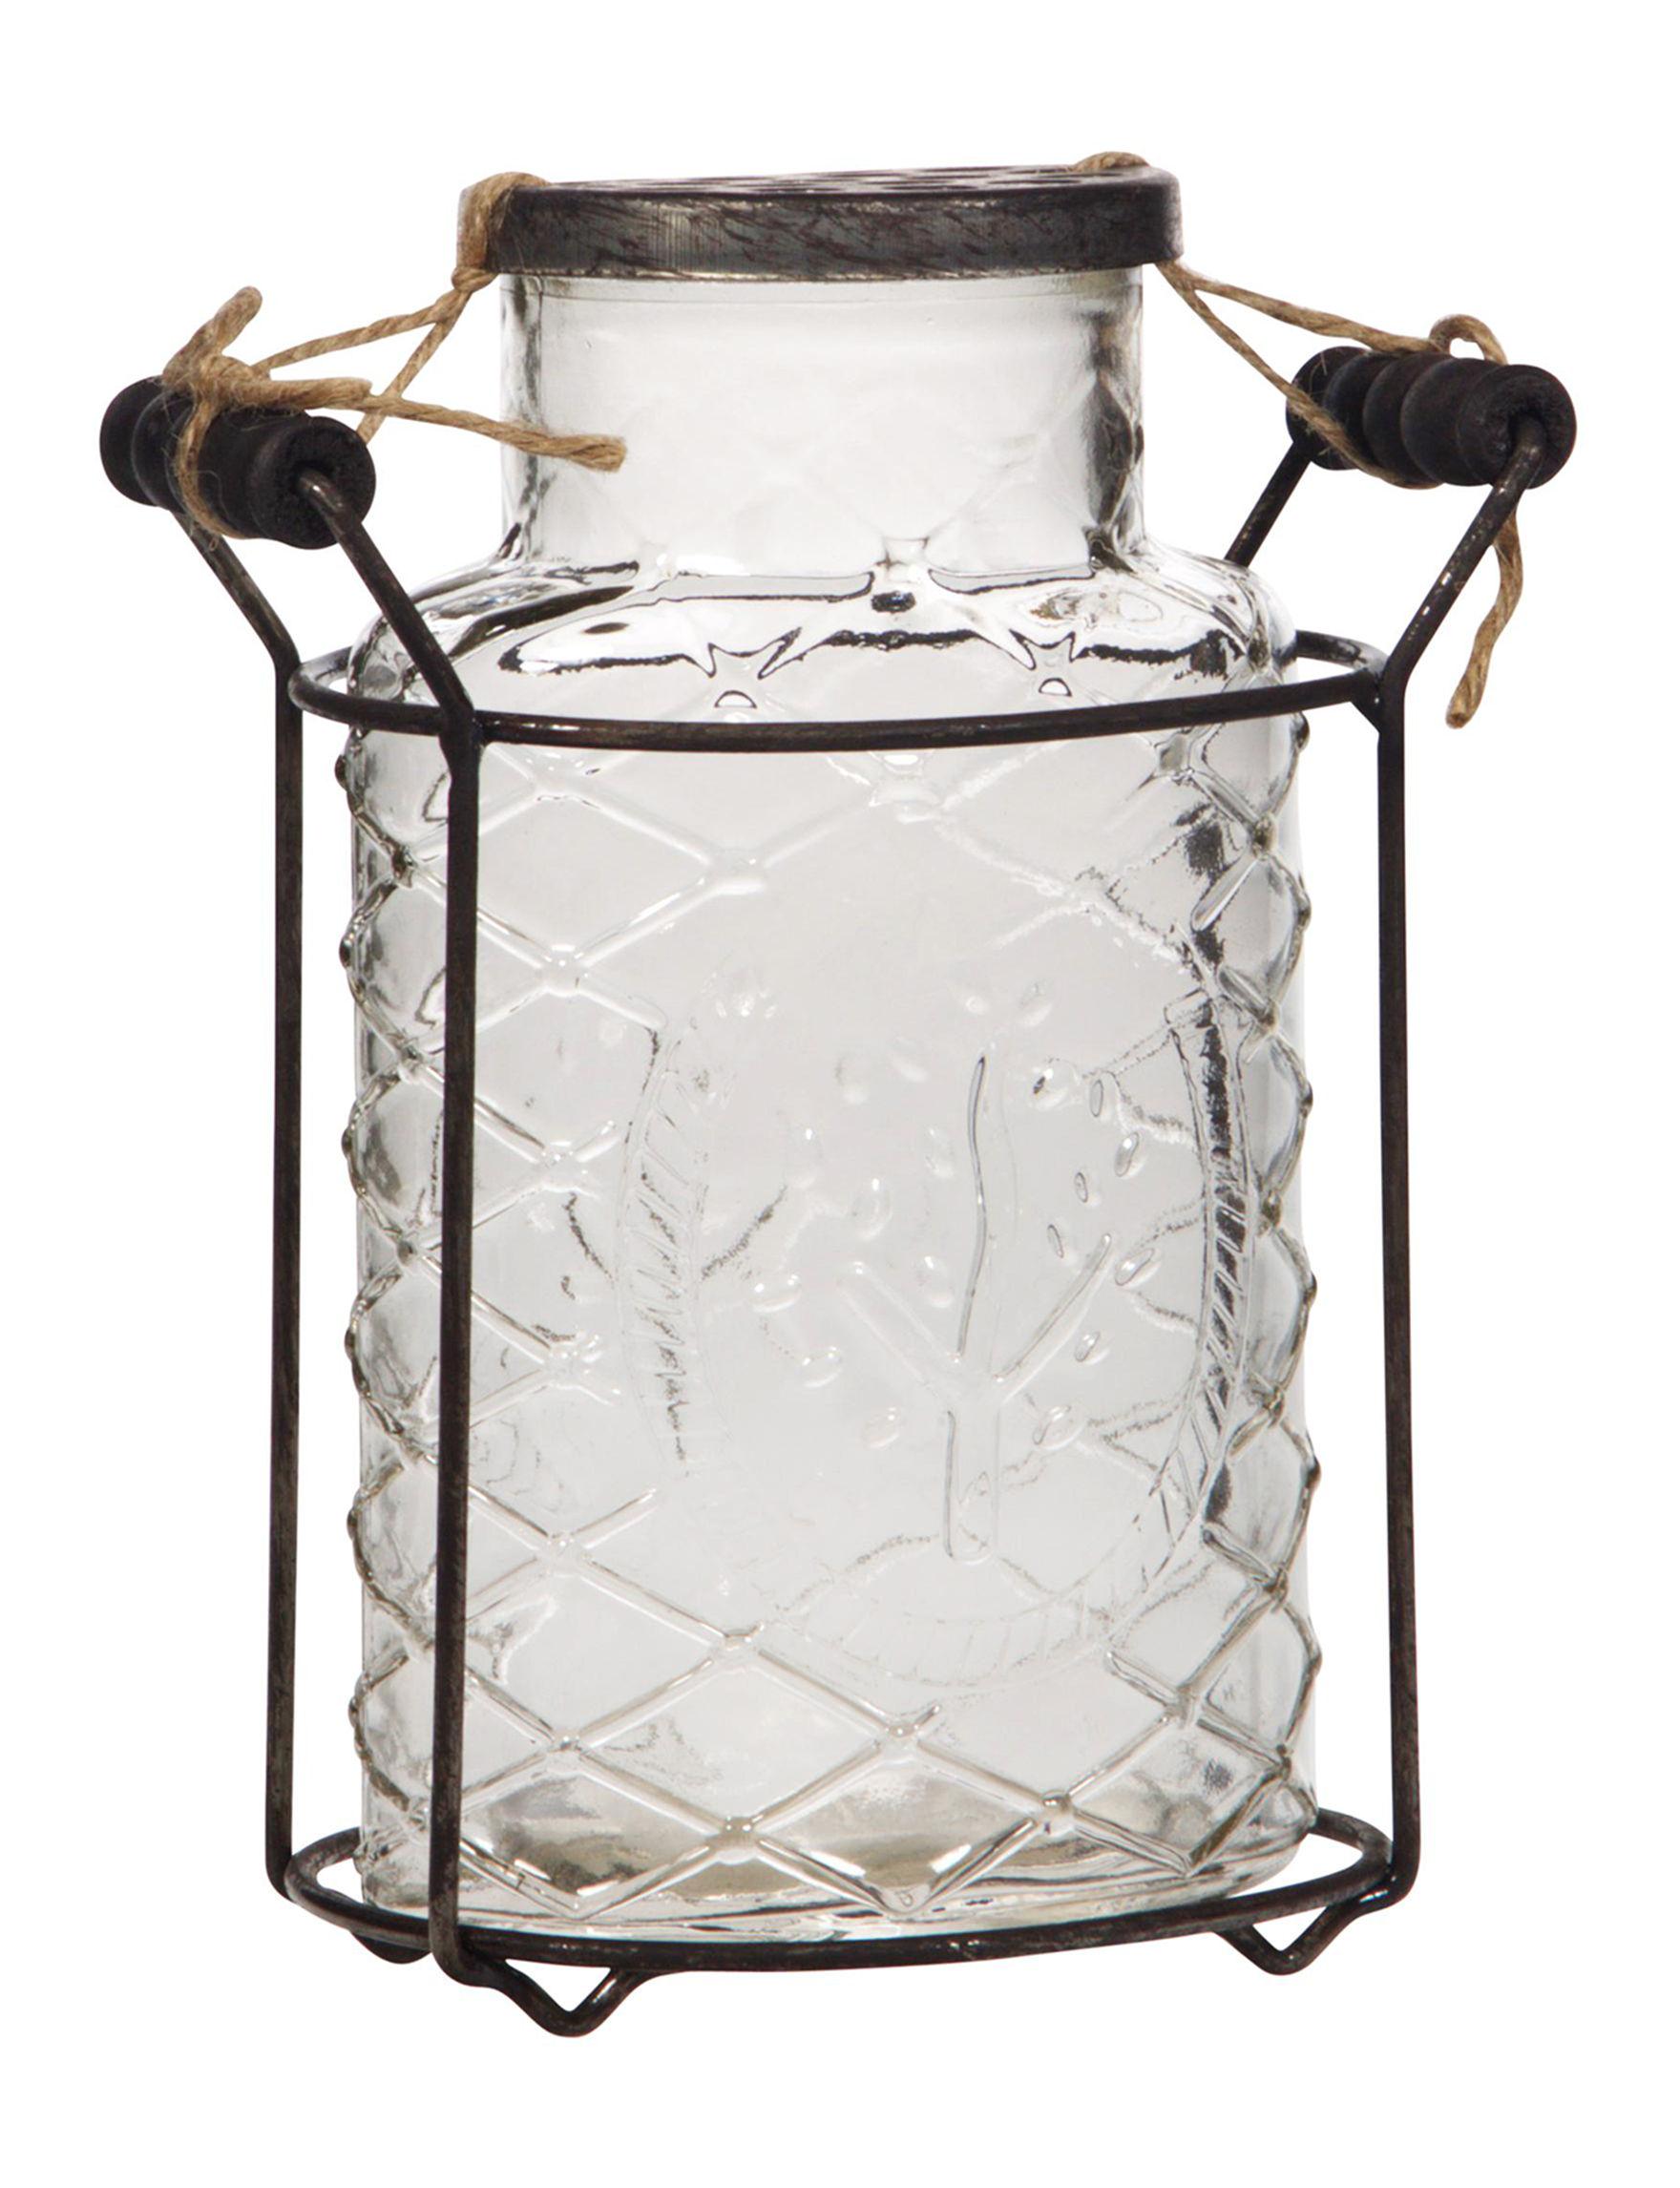 Home Essentials Black Vases & Decorative Bowls Outdoor Decor